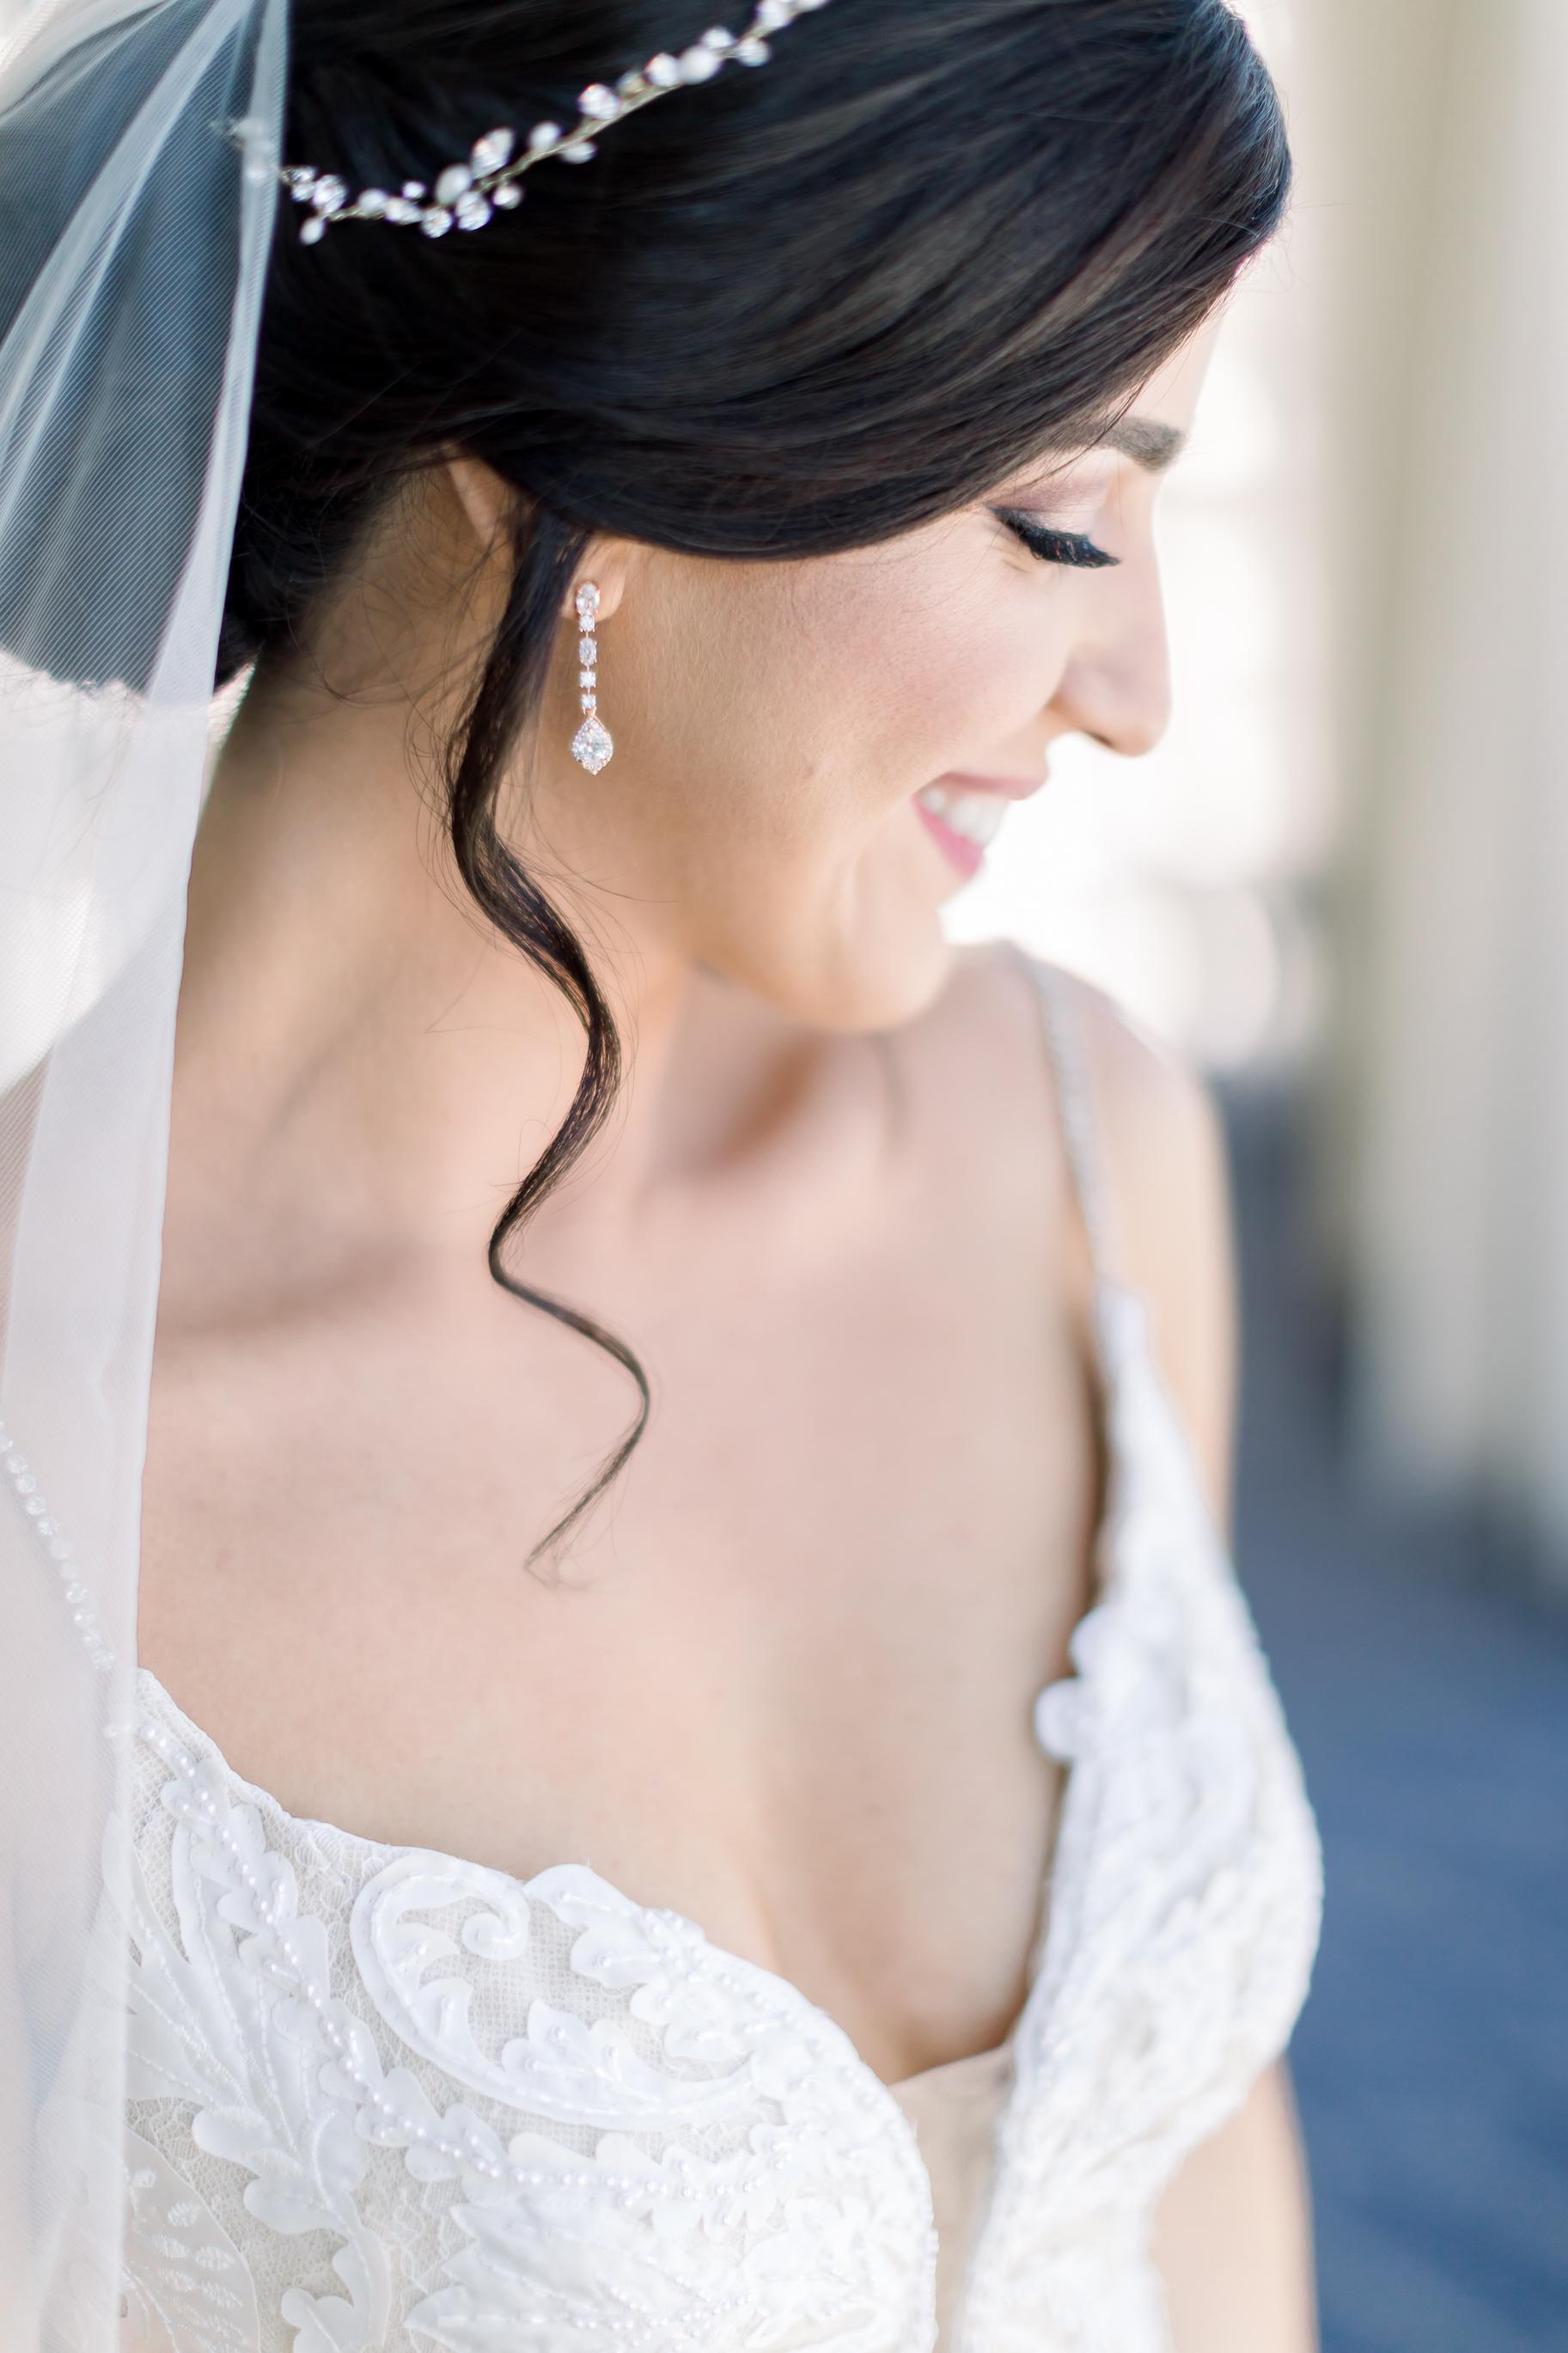 Miami Marriott Biscayne Bay Wedding   Miami Wedding Photographer Dipp Photography